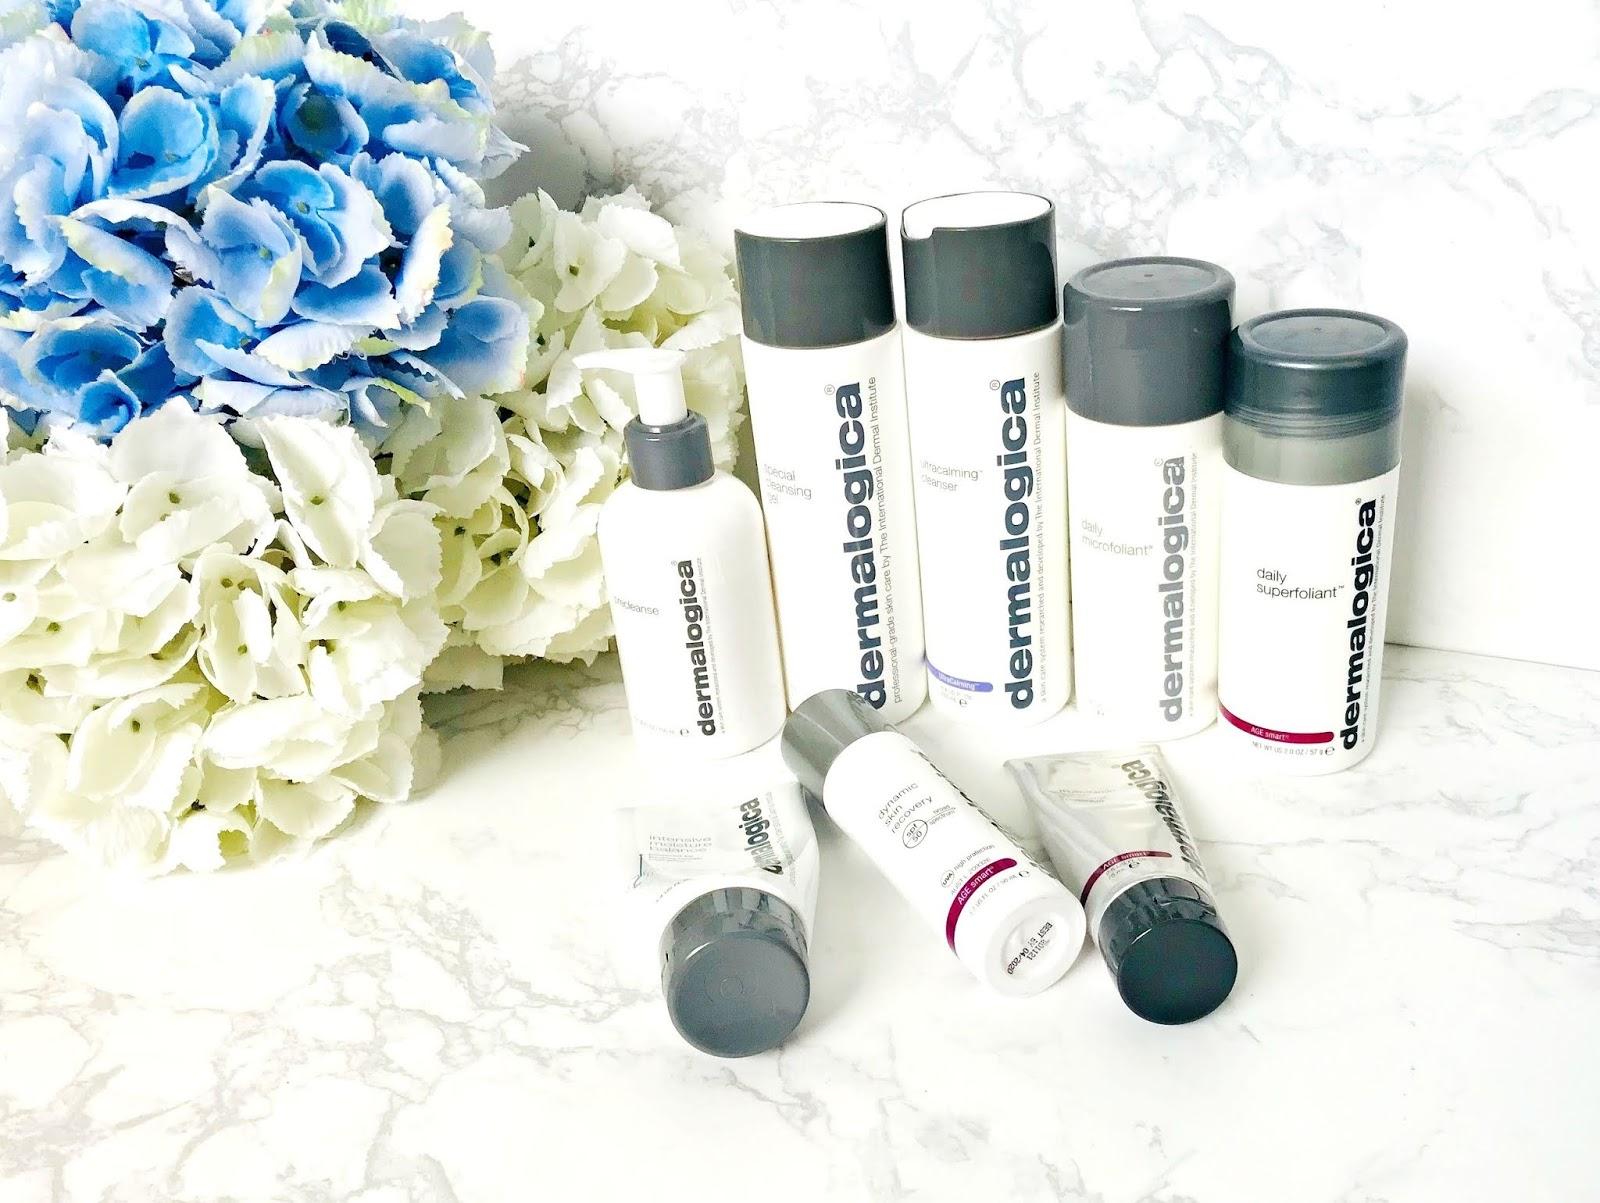 Dermalogica Brand Focus, Dermalogica Brand Overview